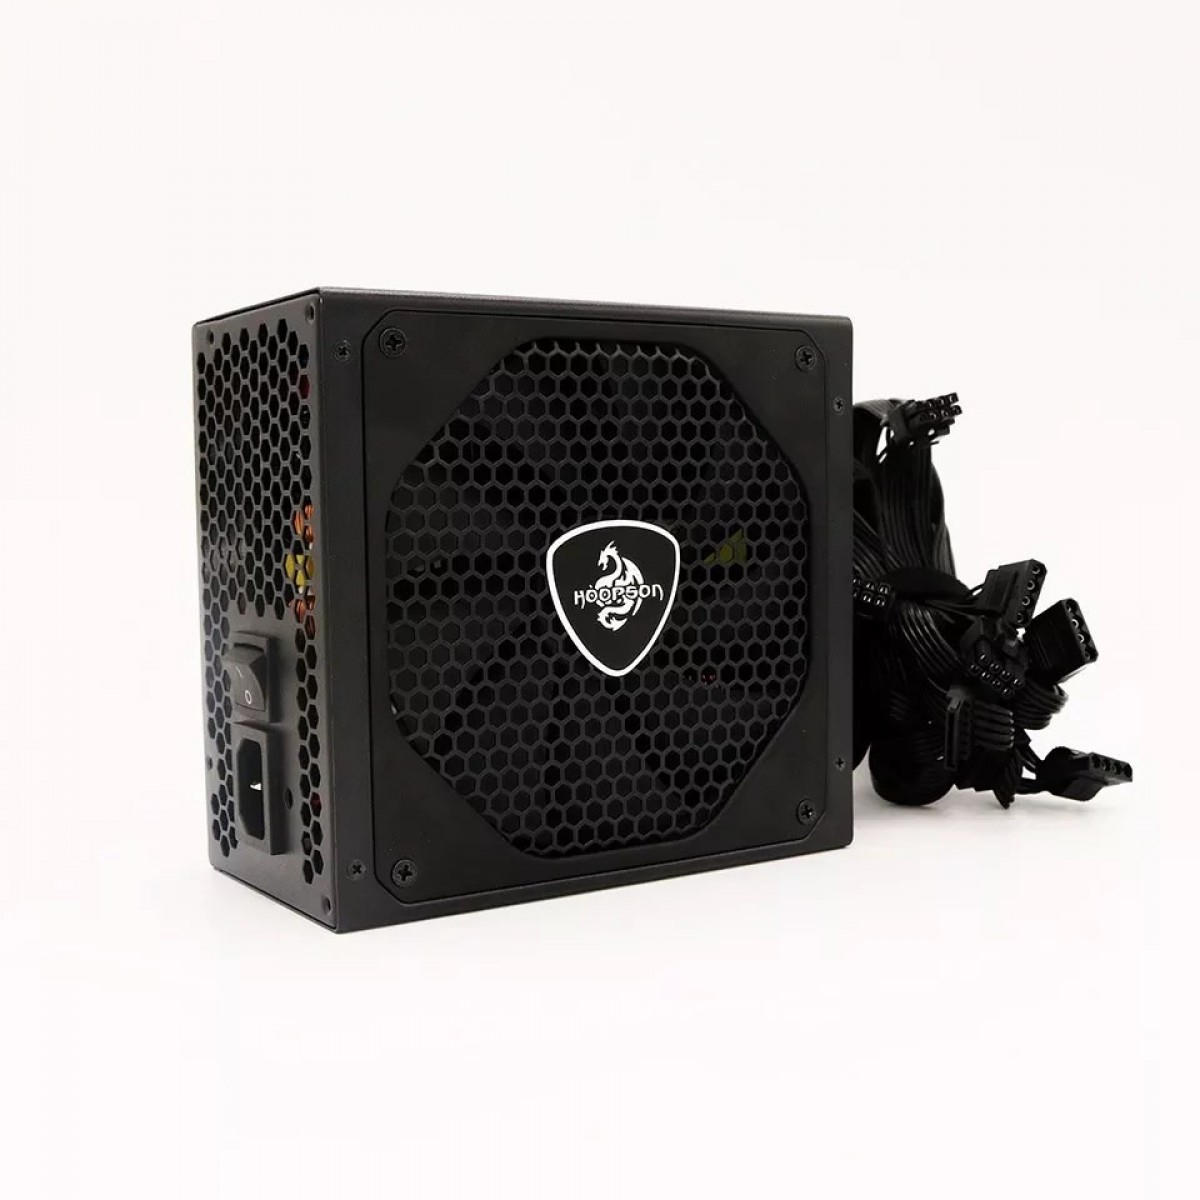 Fonte Gamer Hoopson GT750, 750W, 80 Plus Bronze, ATX